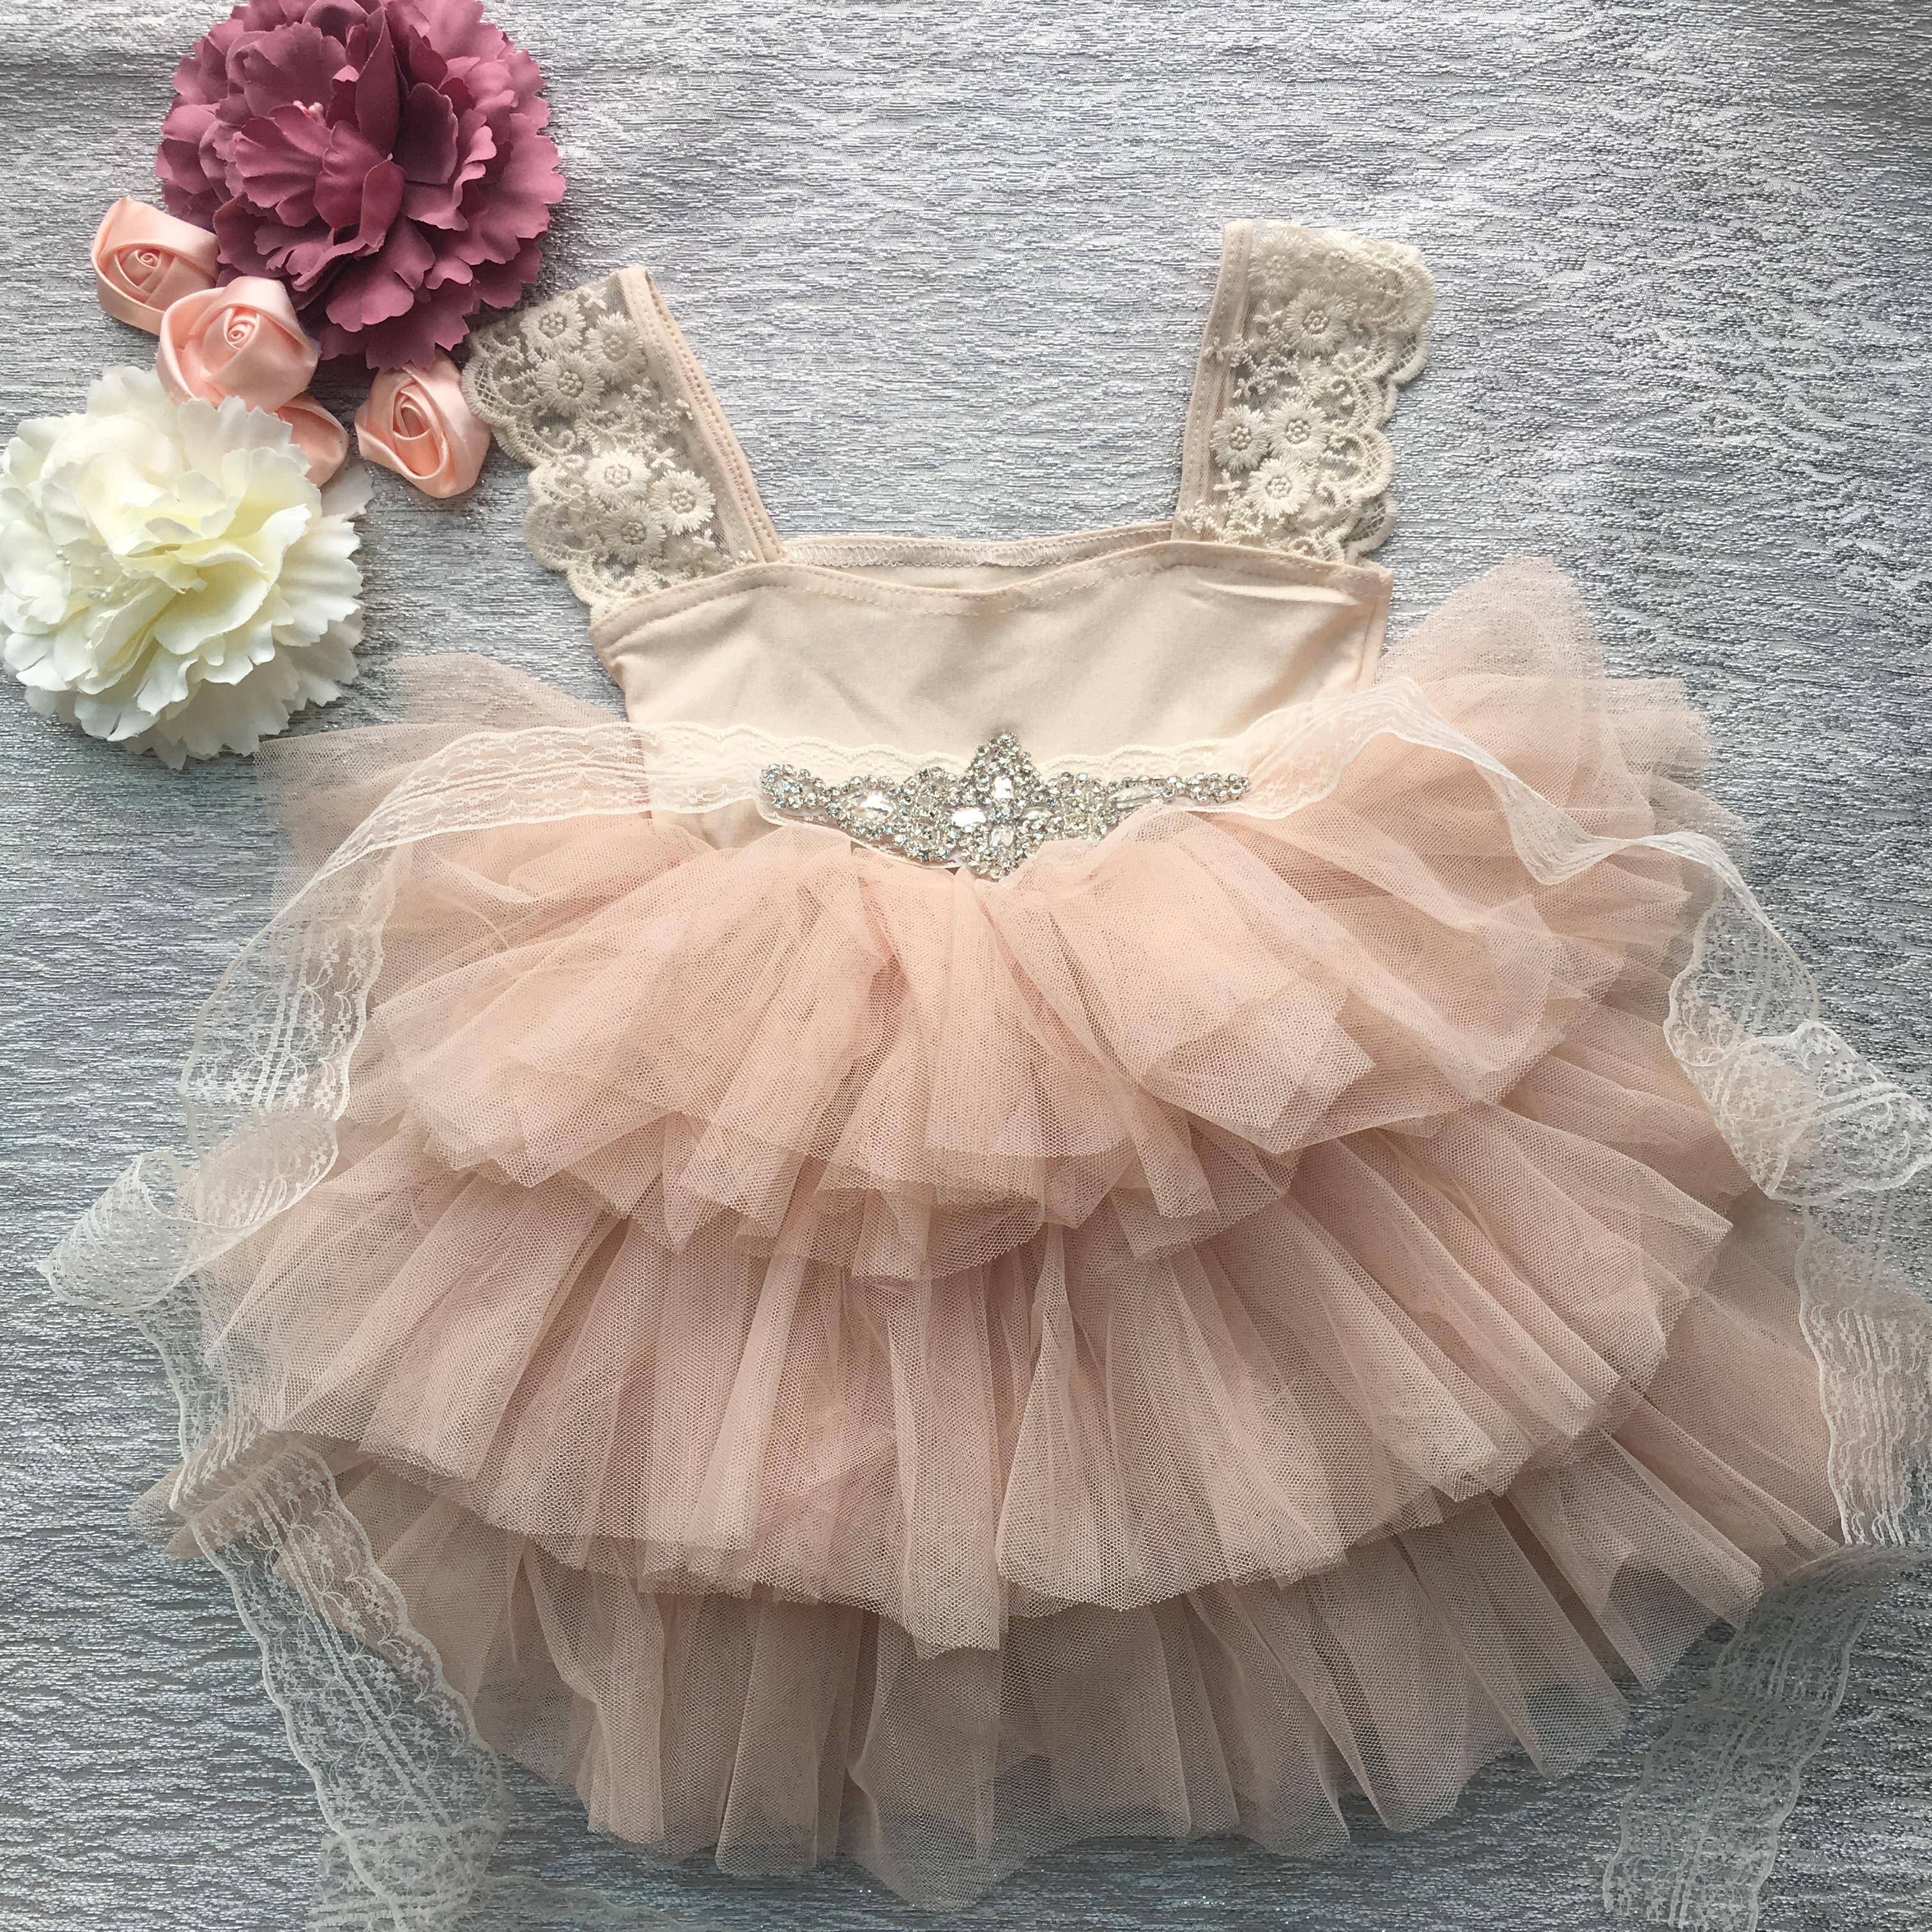 Retail Gorgeous Rhinestone Sashes Girl Evening Dress Baby Girl Lace Sling Princess Tutu Dress Kids Formal Costume 1